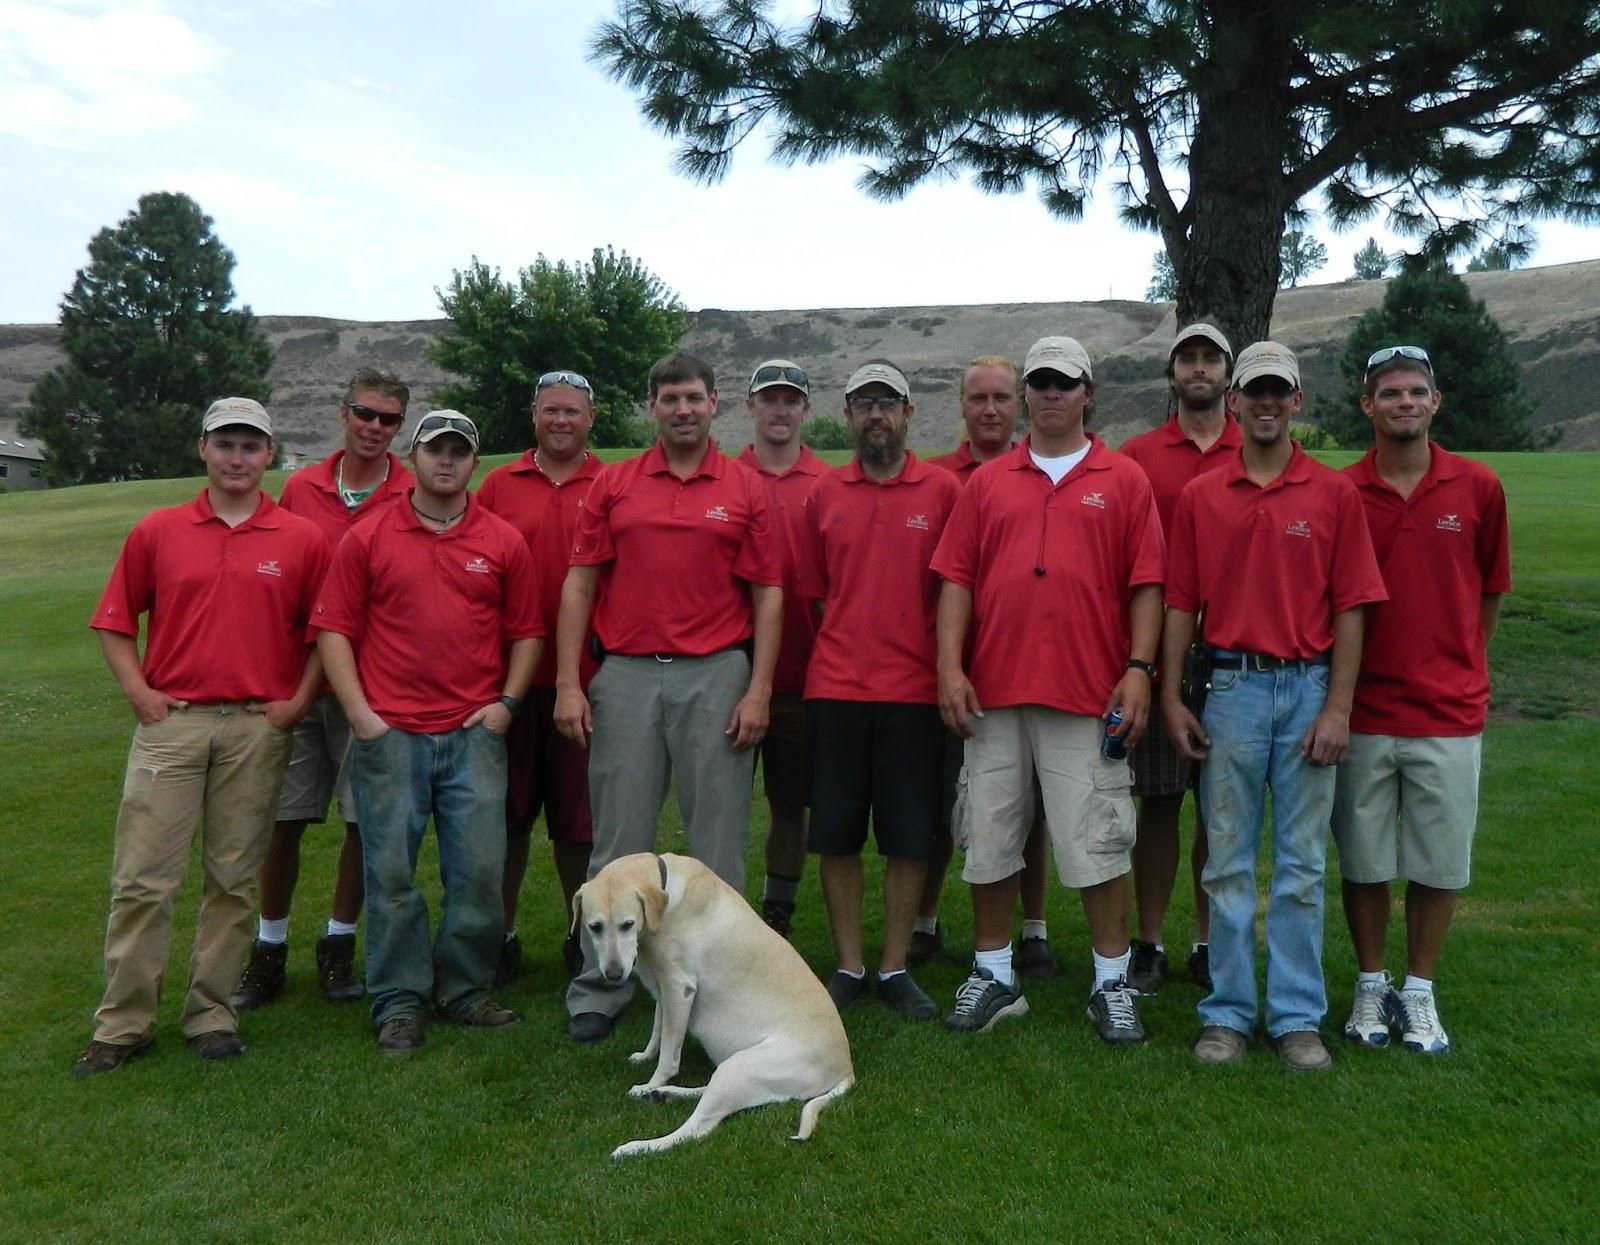 Lgcc golf maintenance staff